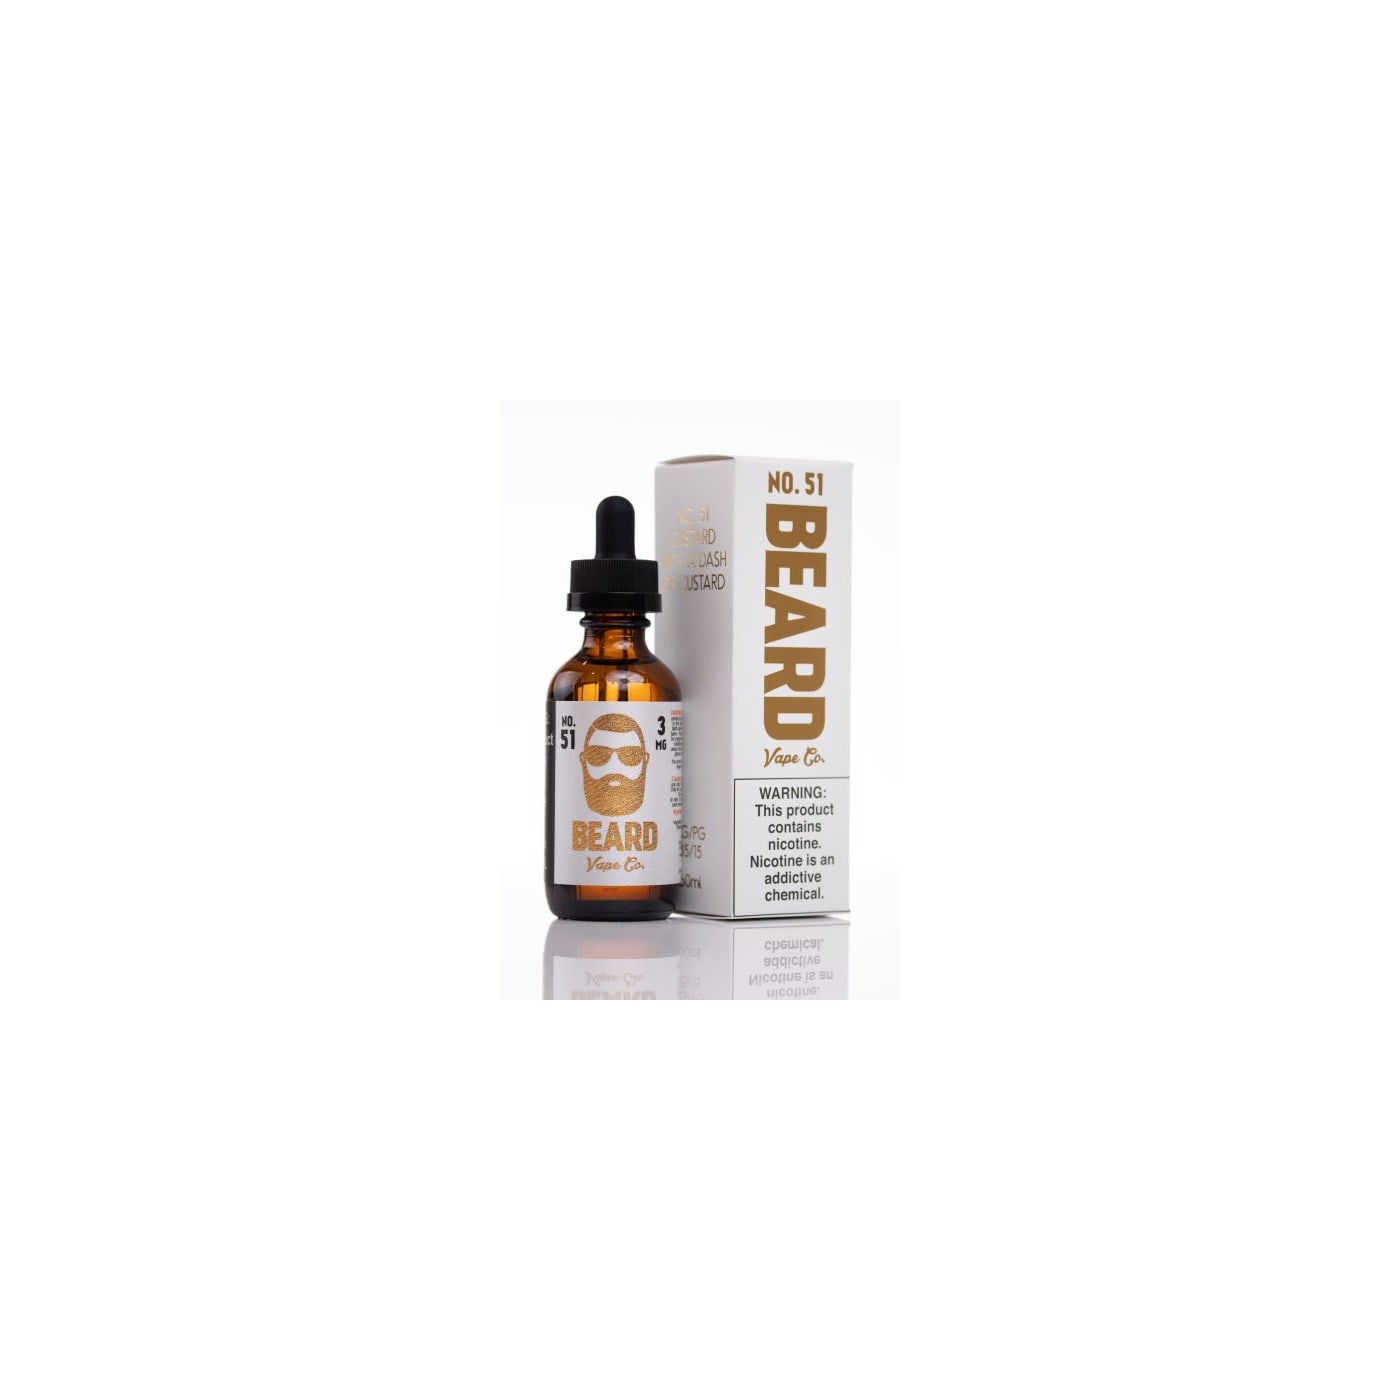 Beard Vape Co No 51 Custard E Liquid 60ml Vaporbeast - Www imagez co